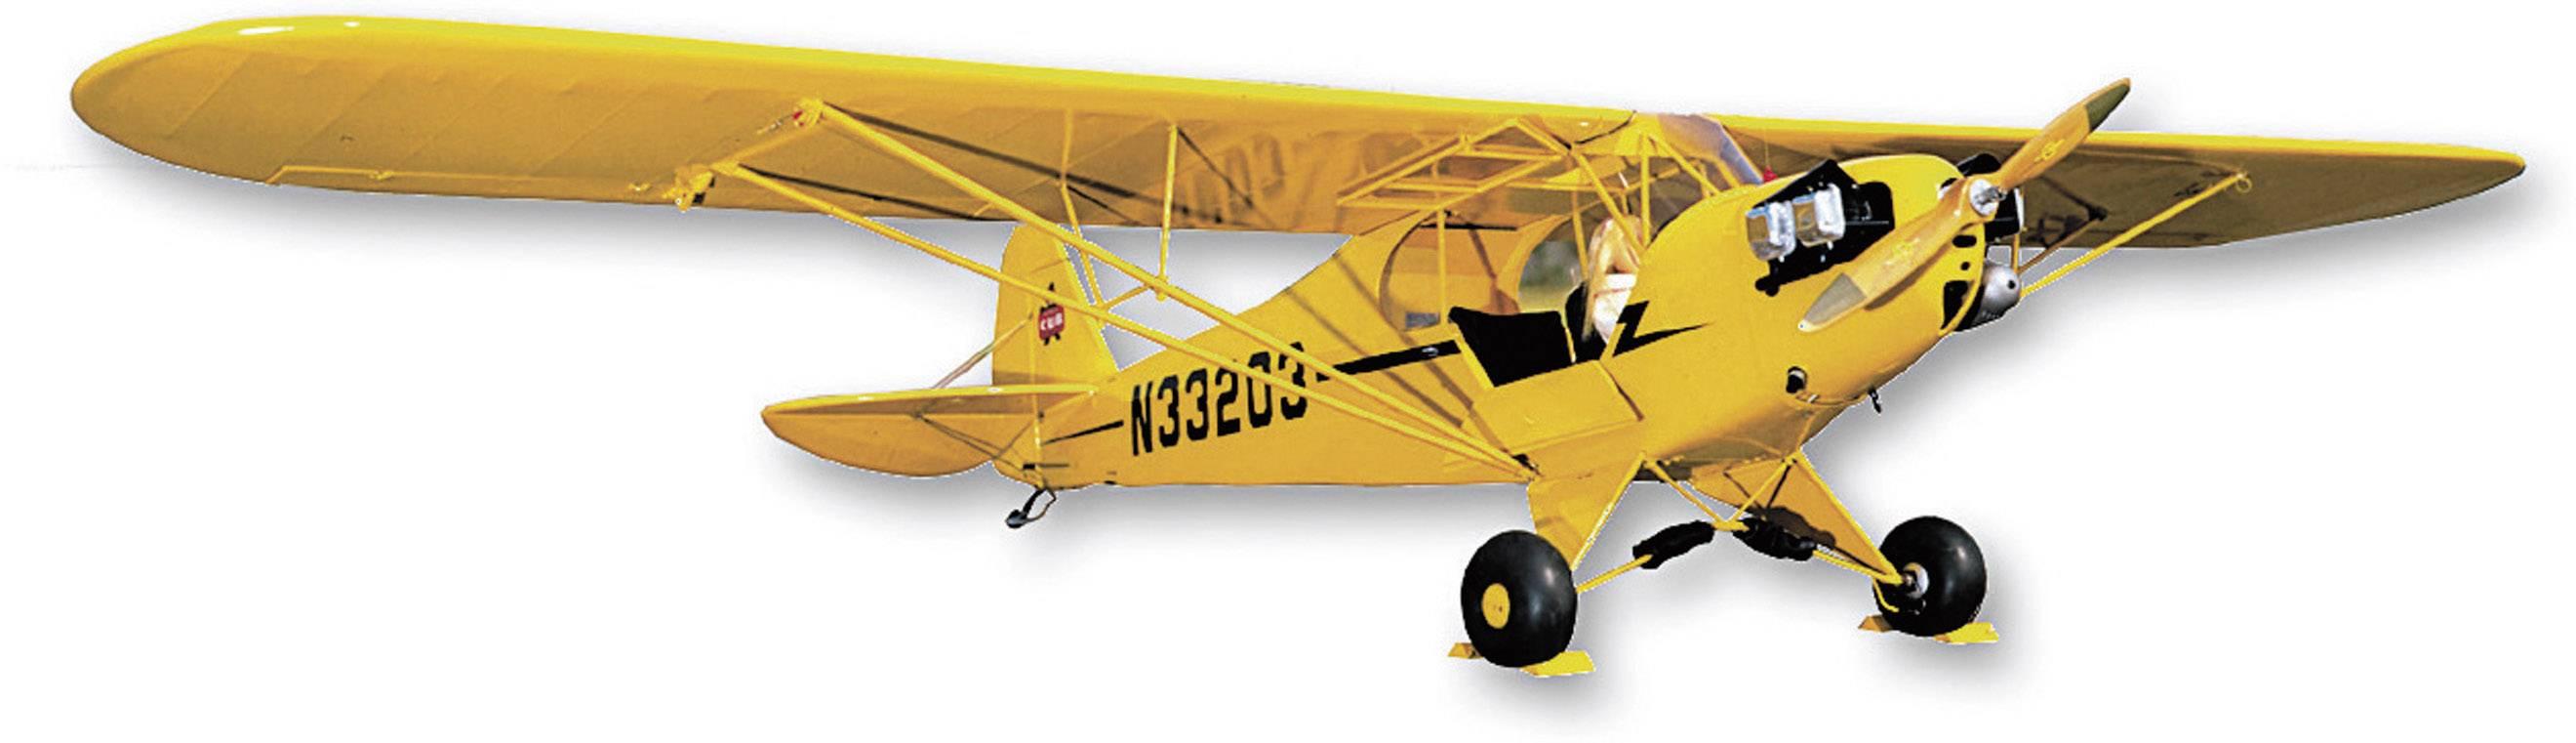 Nitro model letadla SIG Piper J-3 Cub BS, 1 800 mm